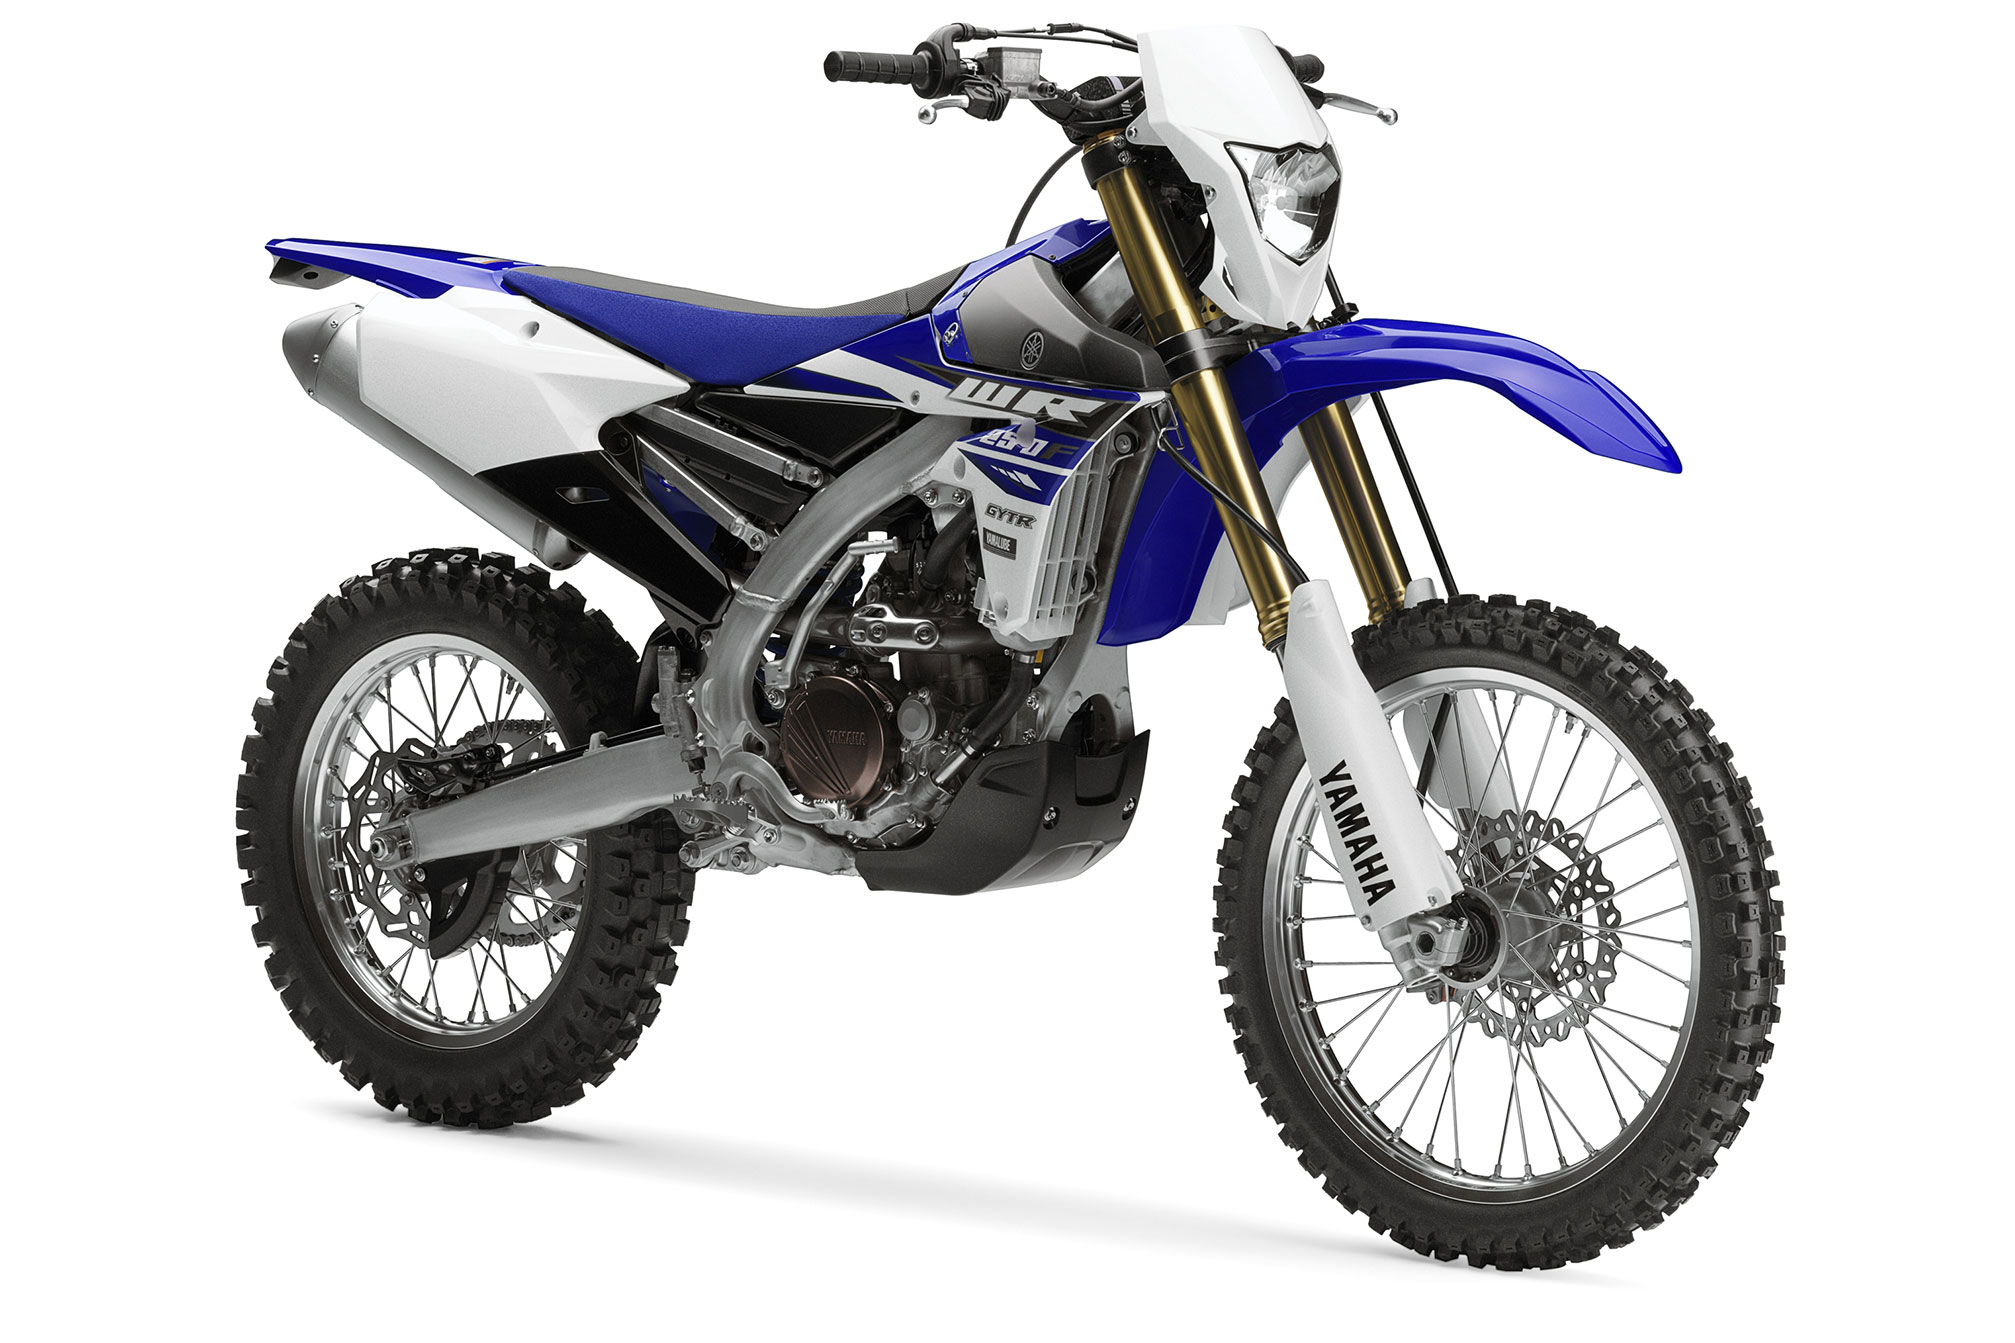 мотоцикл kawasaki ninja zx9r